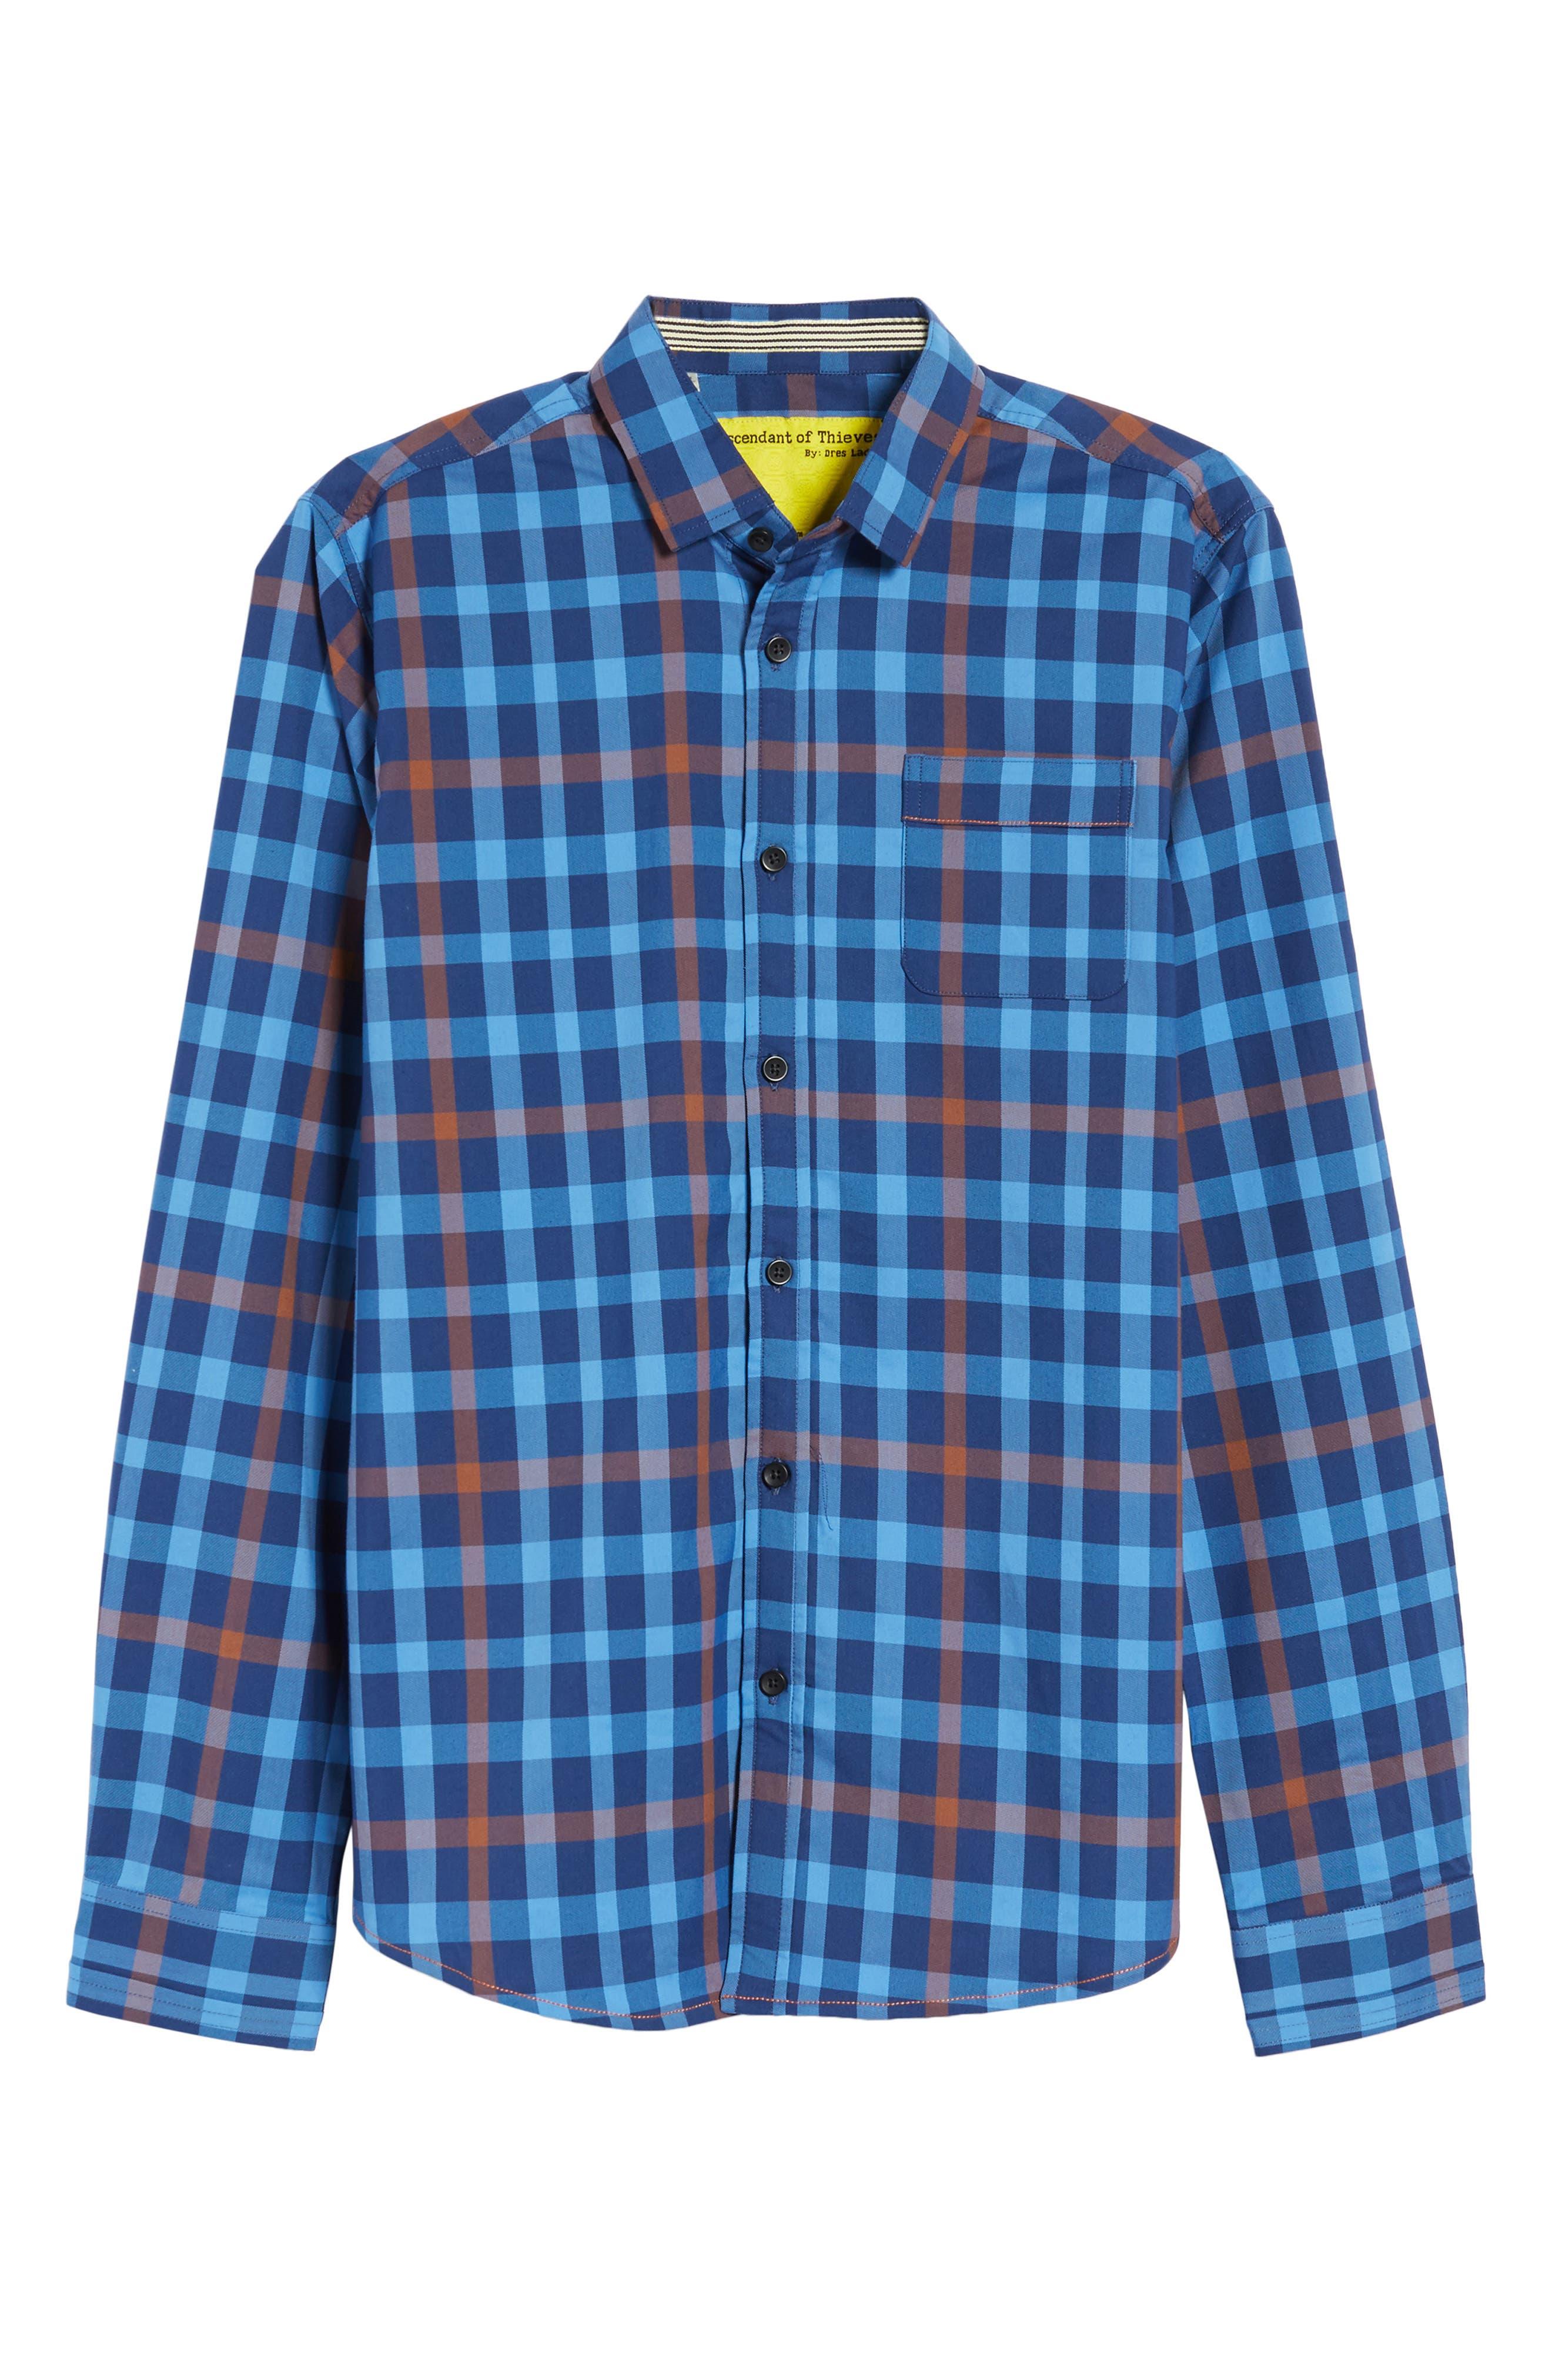 Alternate Image 5  - Descendant of Thieves Plaid Sport Shirt